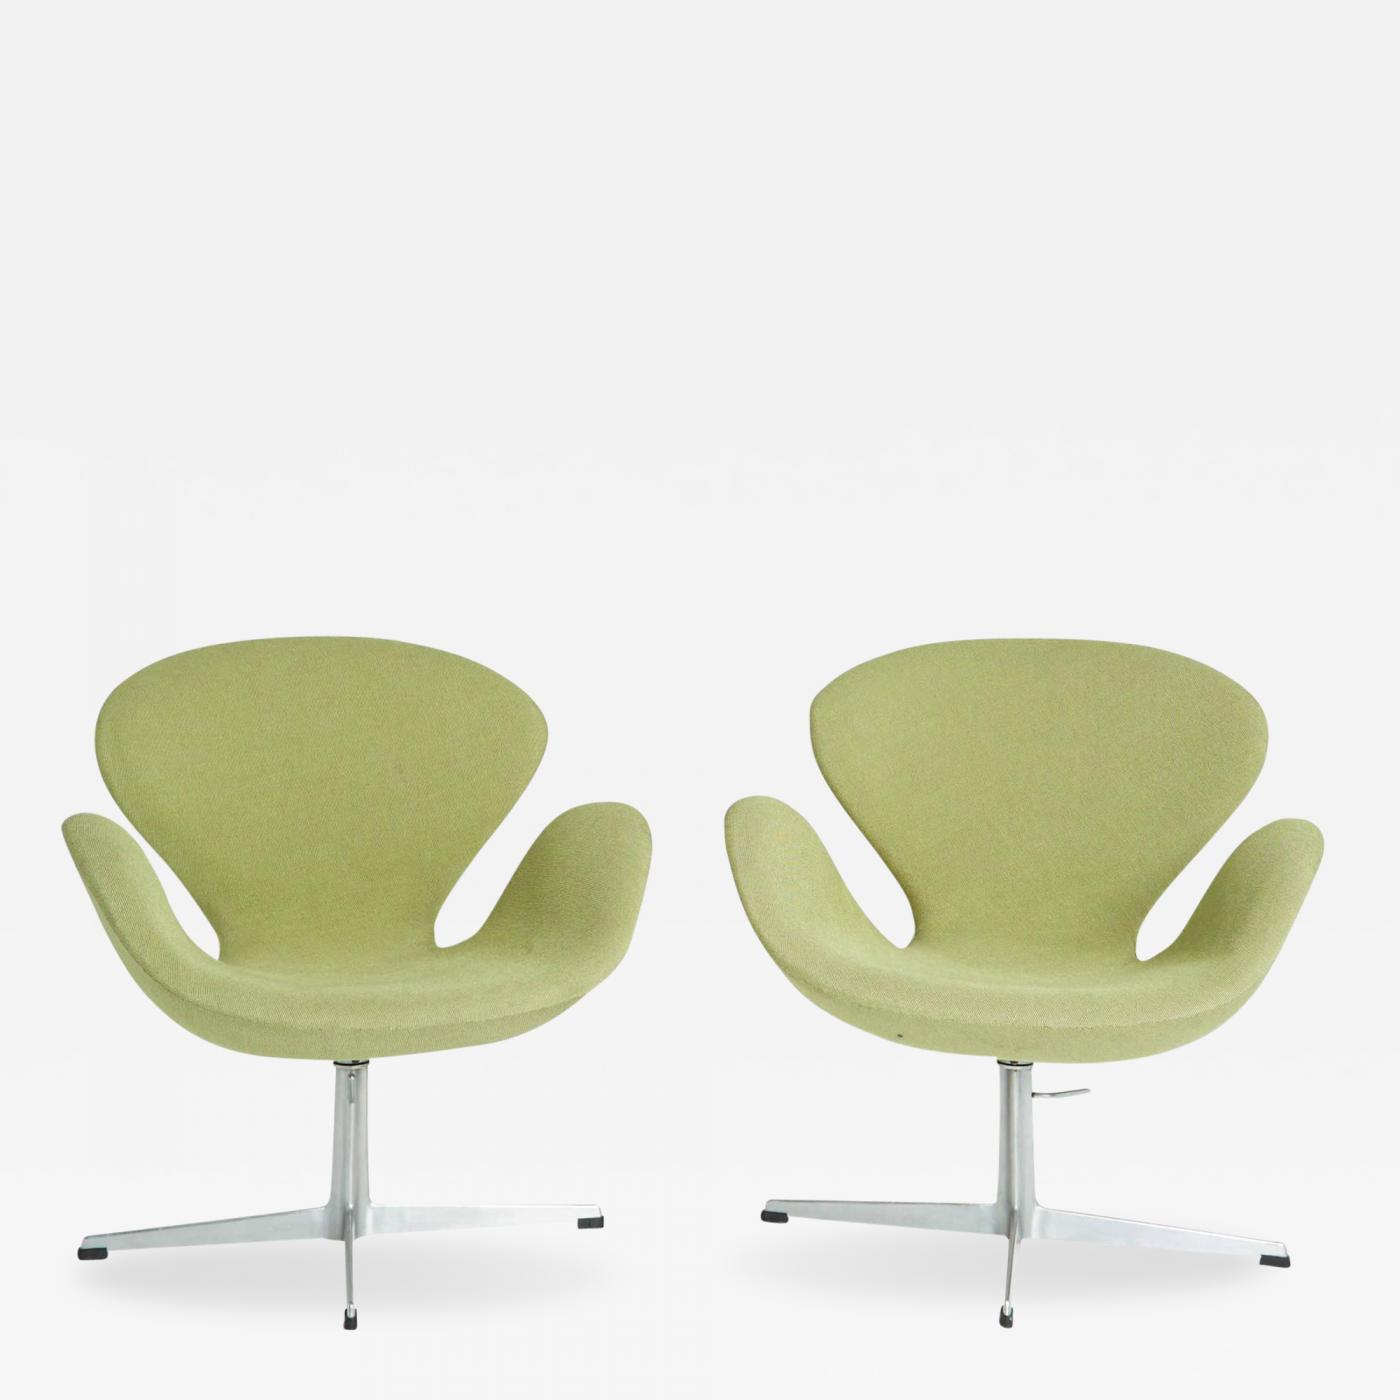 Arne Jacobsen Swan Chairs by Arne Jacobsen for Fritz Hansen